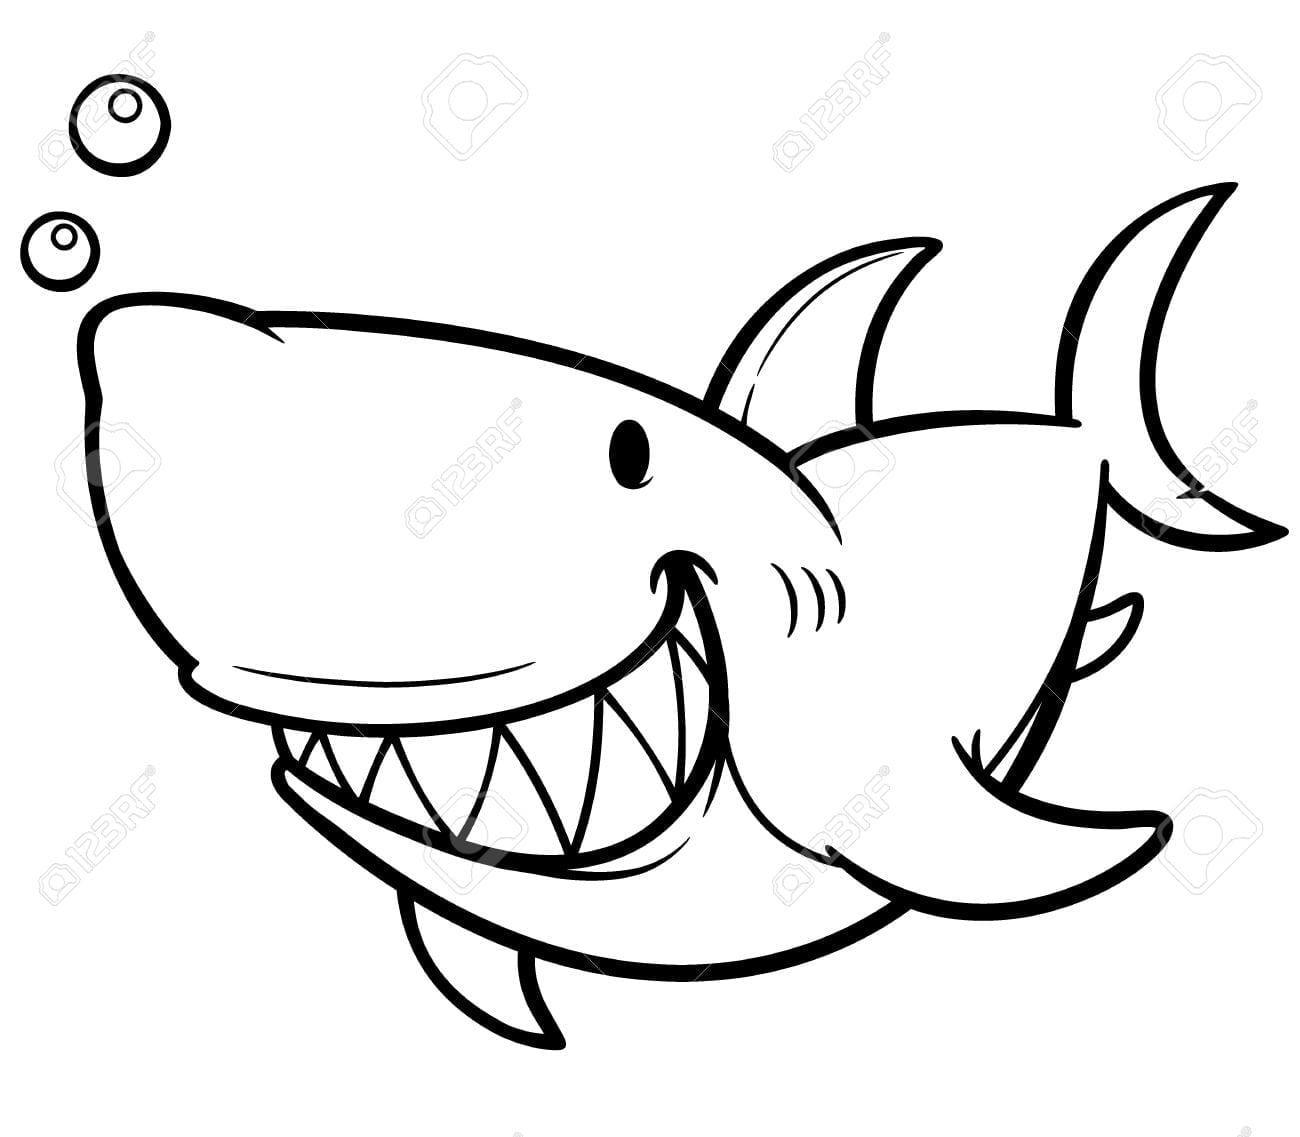 Shark Anatomy Worksheet Coloring